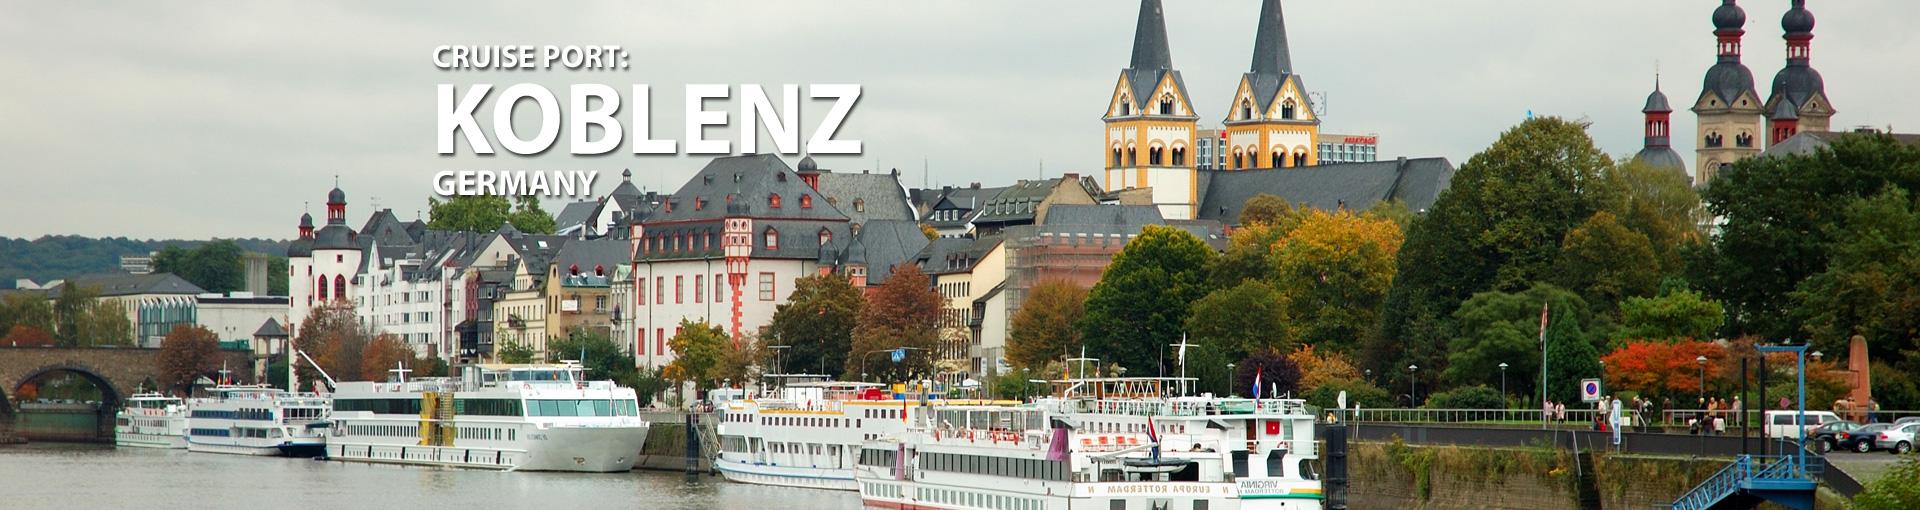 Cruises to Koblenz, Germany